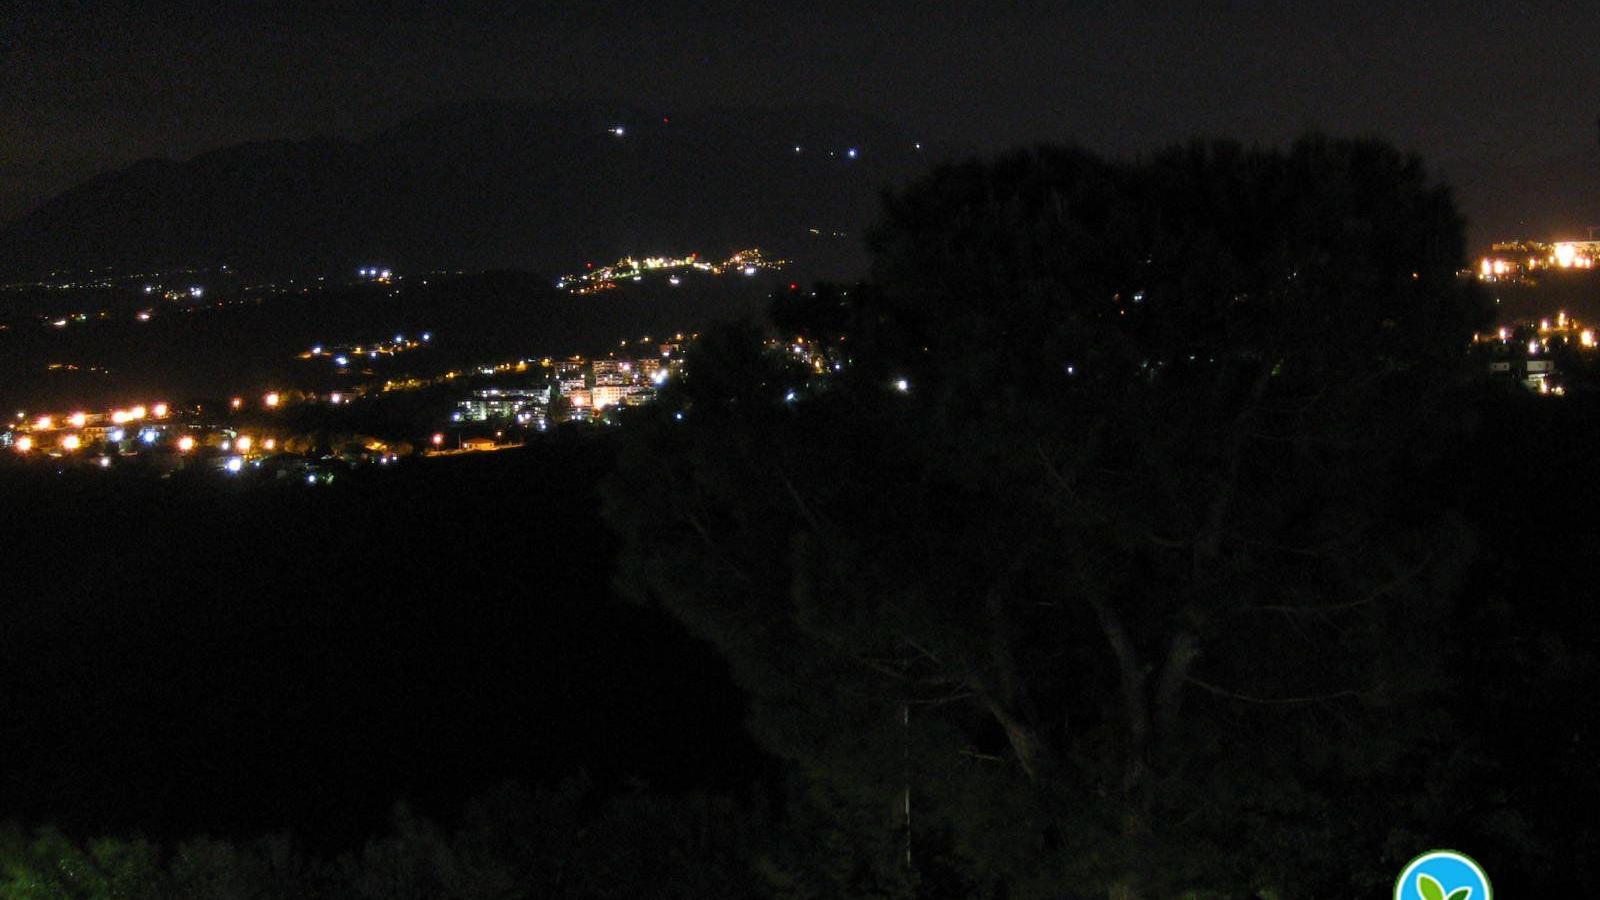 Webkamera Torrevecchia Teatina: Panorama a Sud con sfondo su